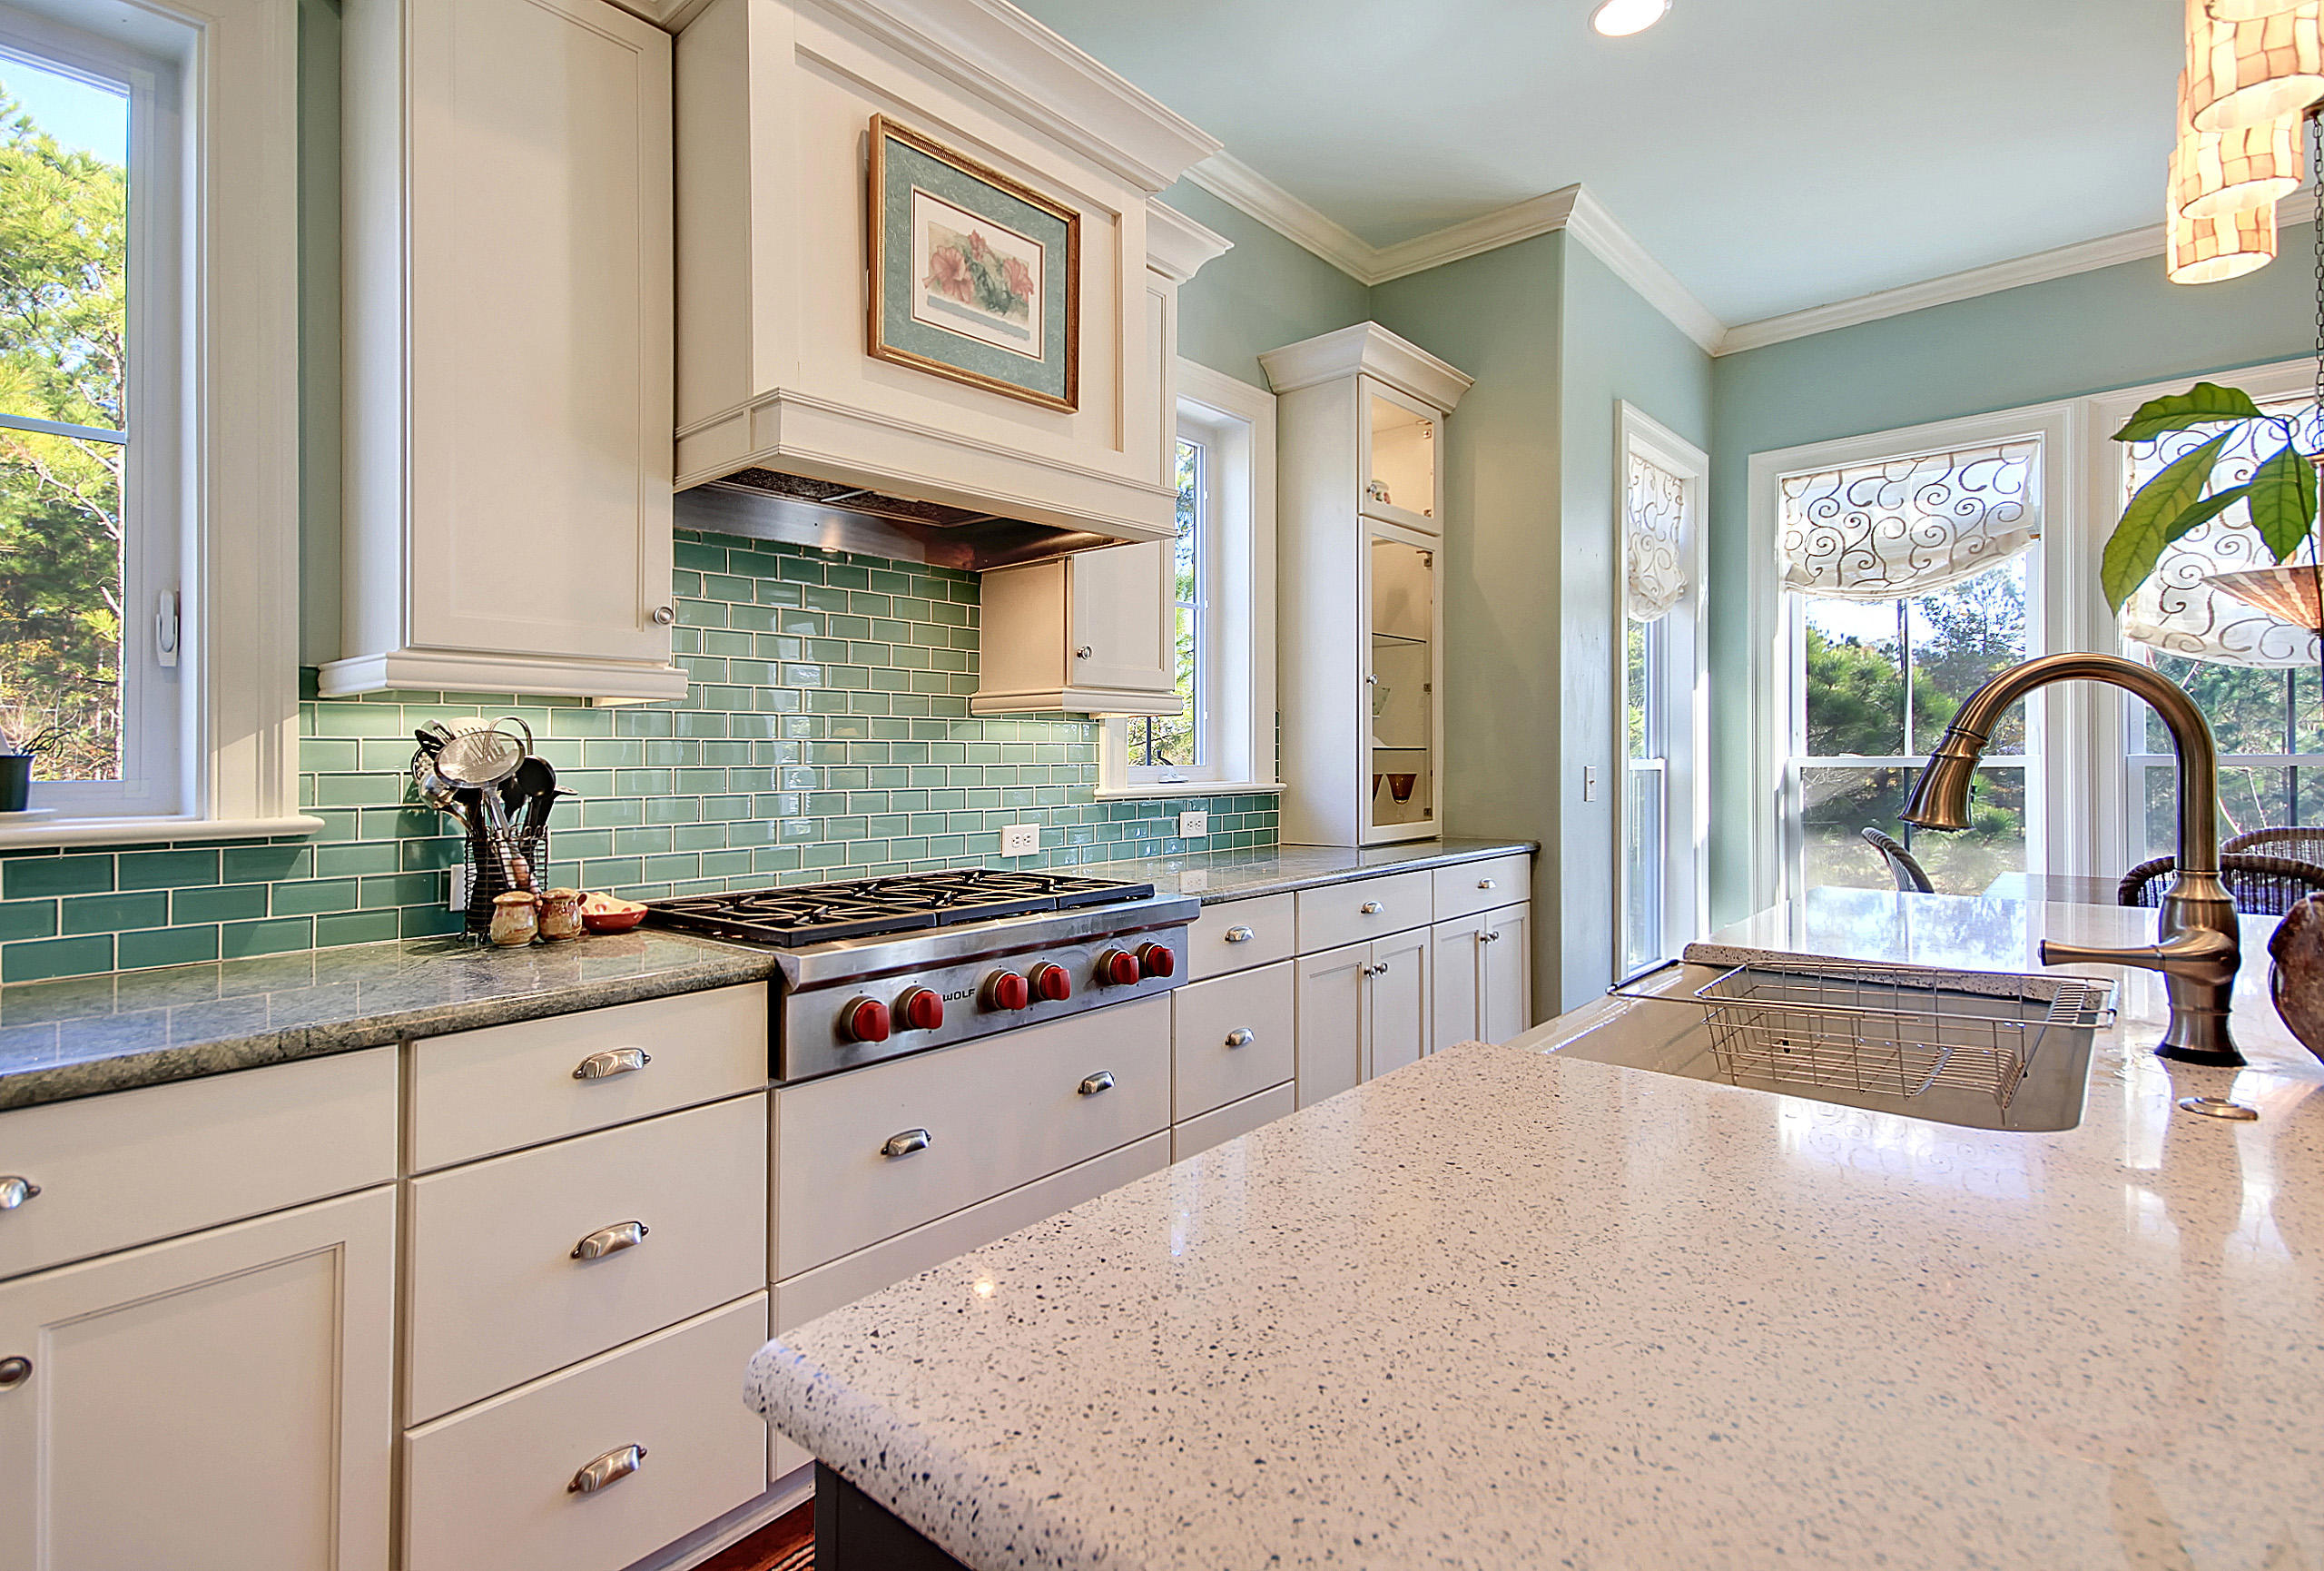 Rivertowne Country Club Homes For Sale - 2601 Kiln Creek, Mount Pleasant, SC - 67